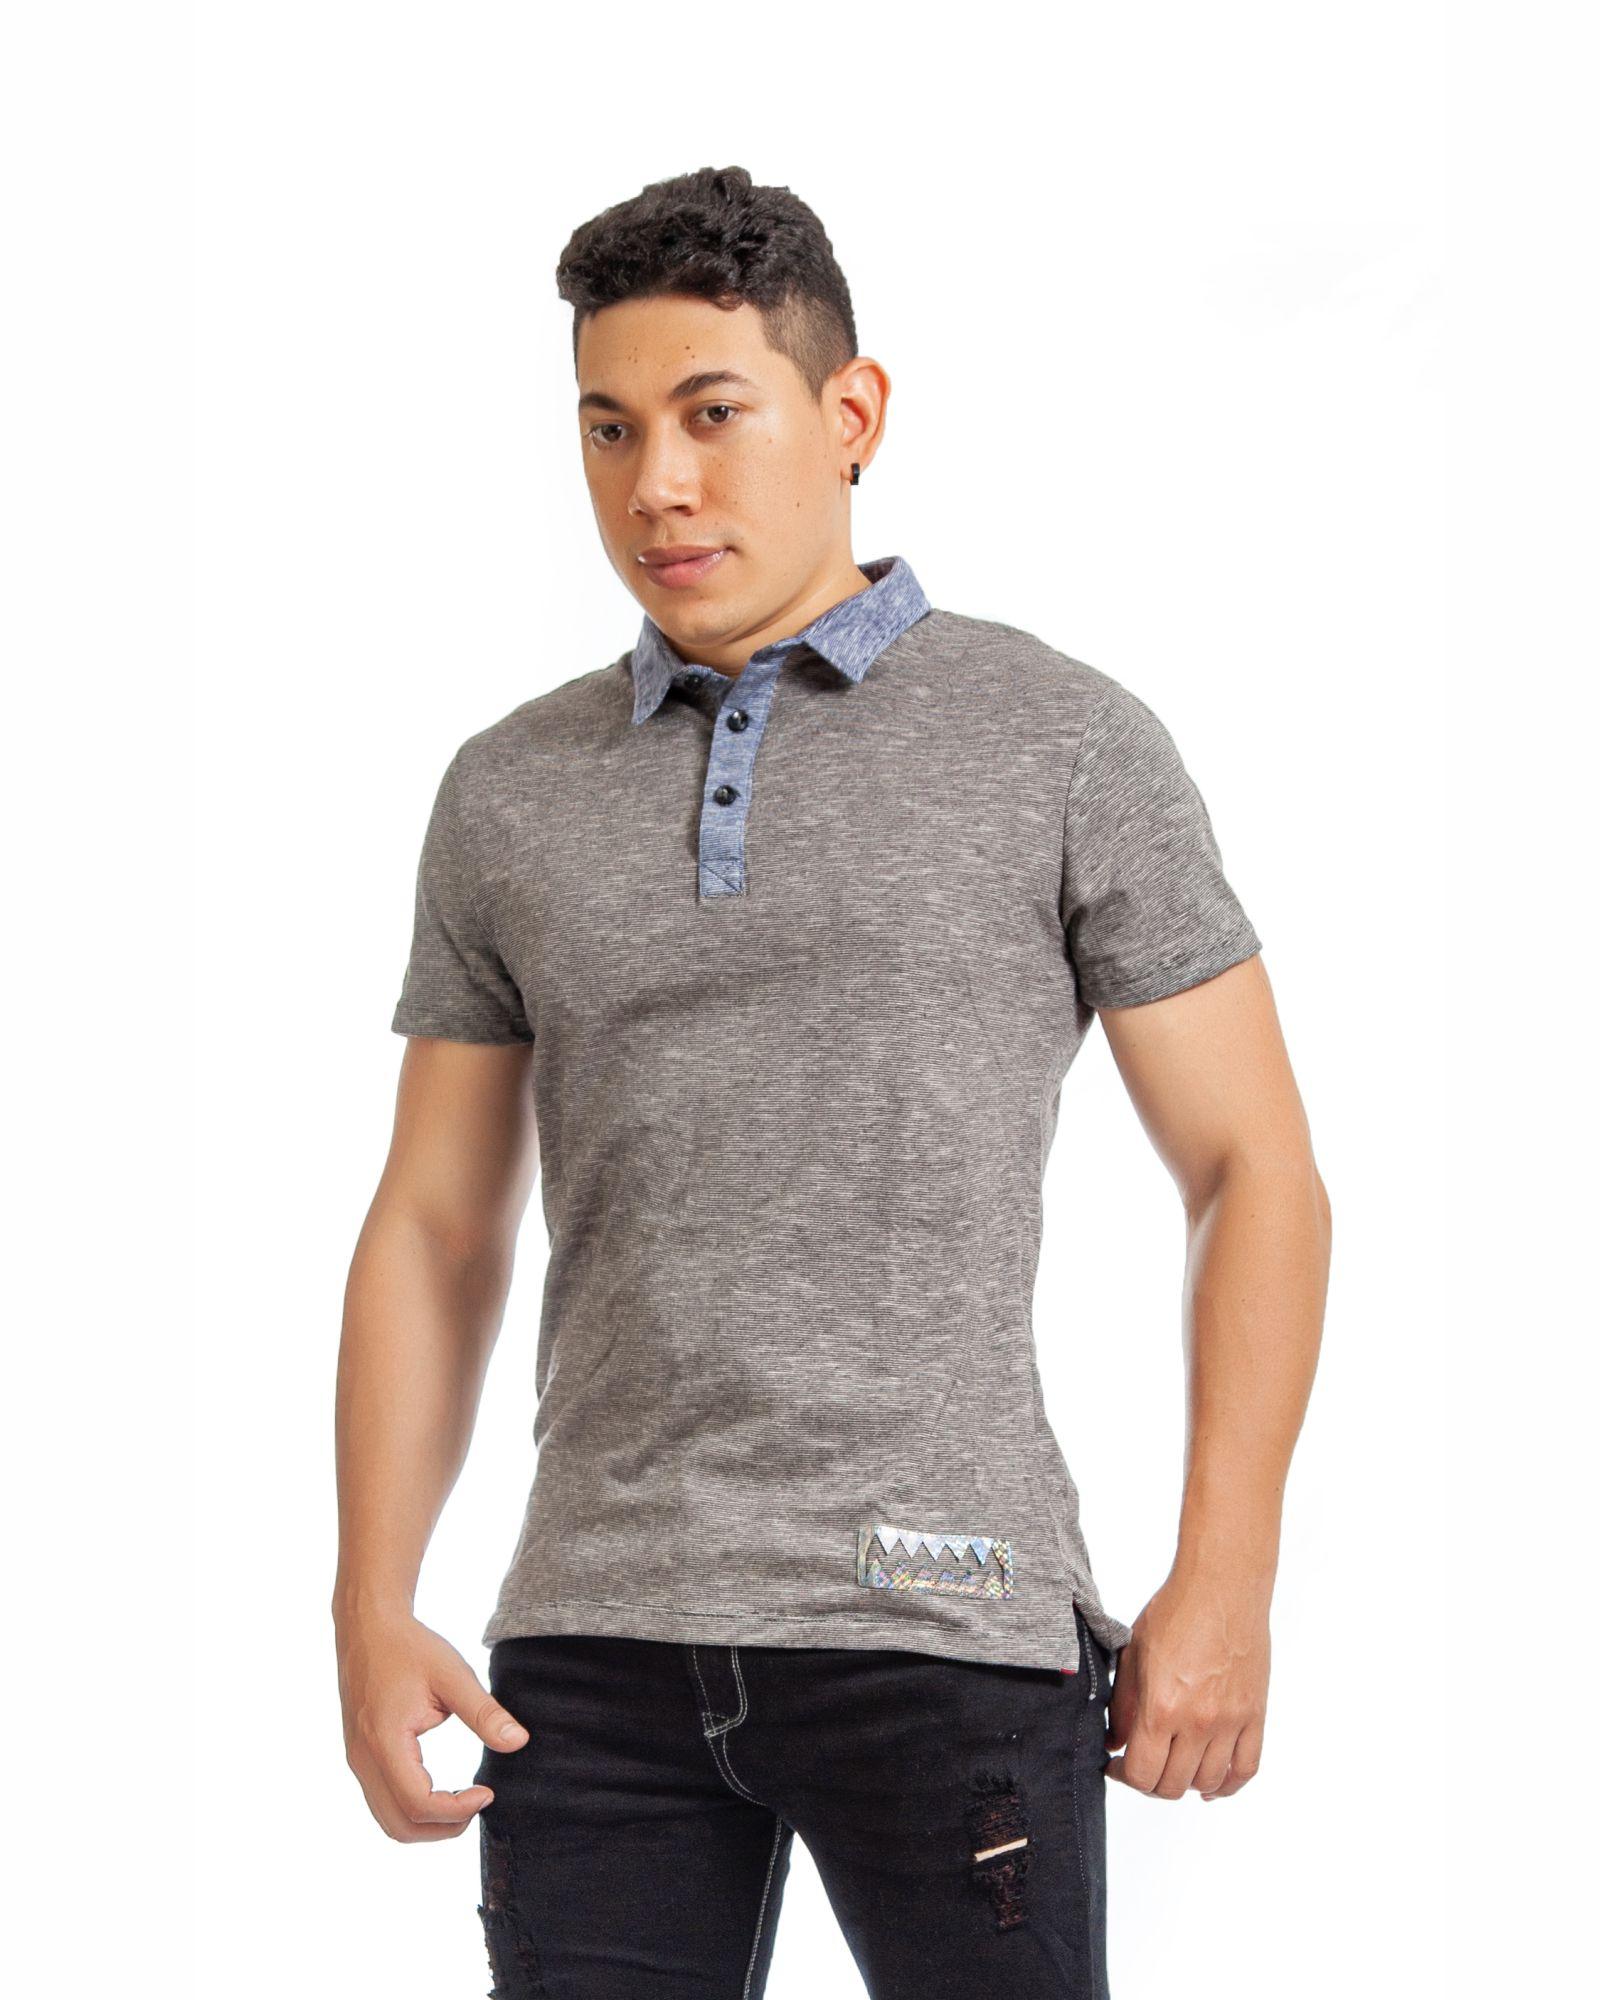 ref 1753 1 polo jersey gris – cuello azul, tela algodon jersey 98% + 2% expande $52.000